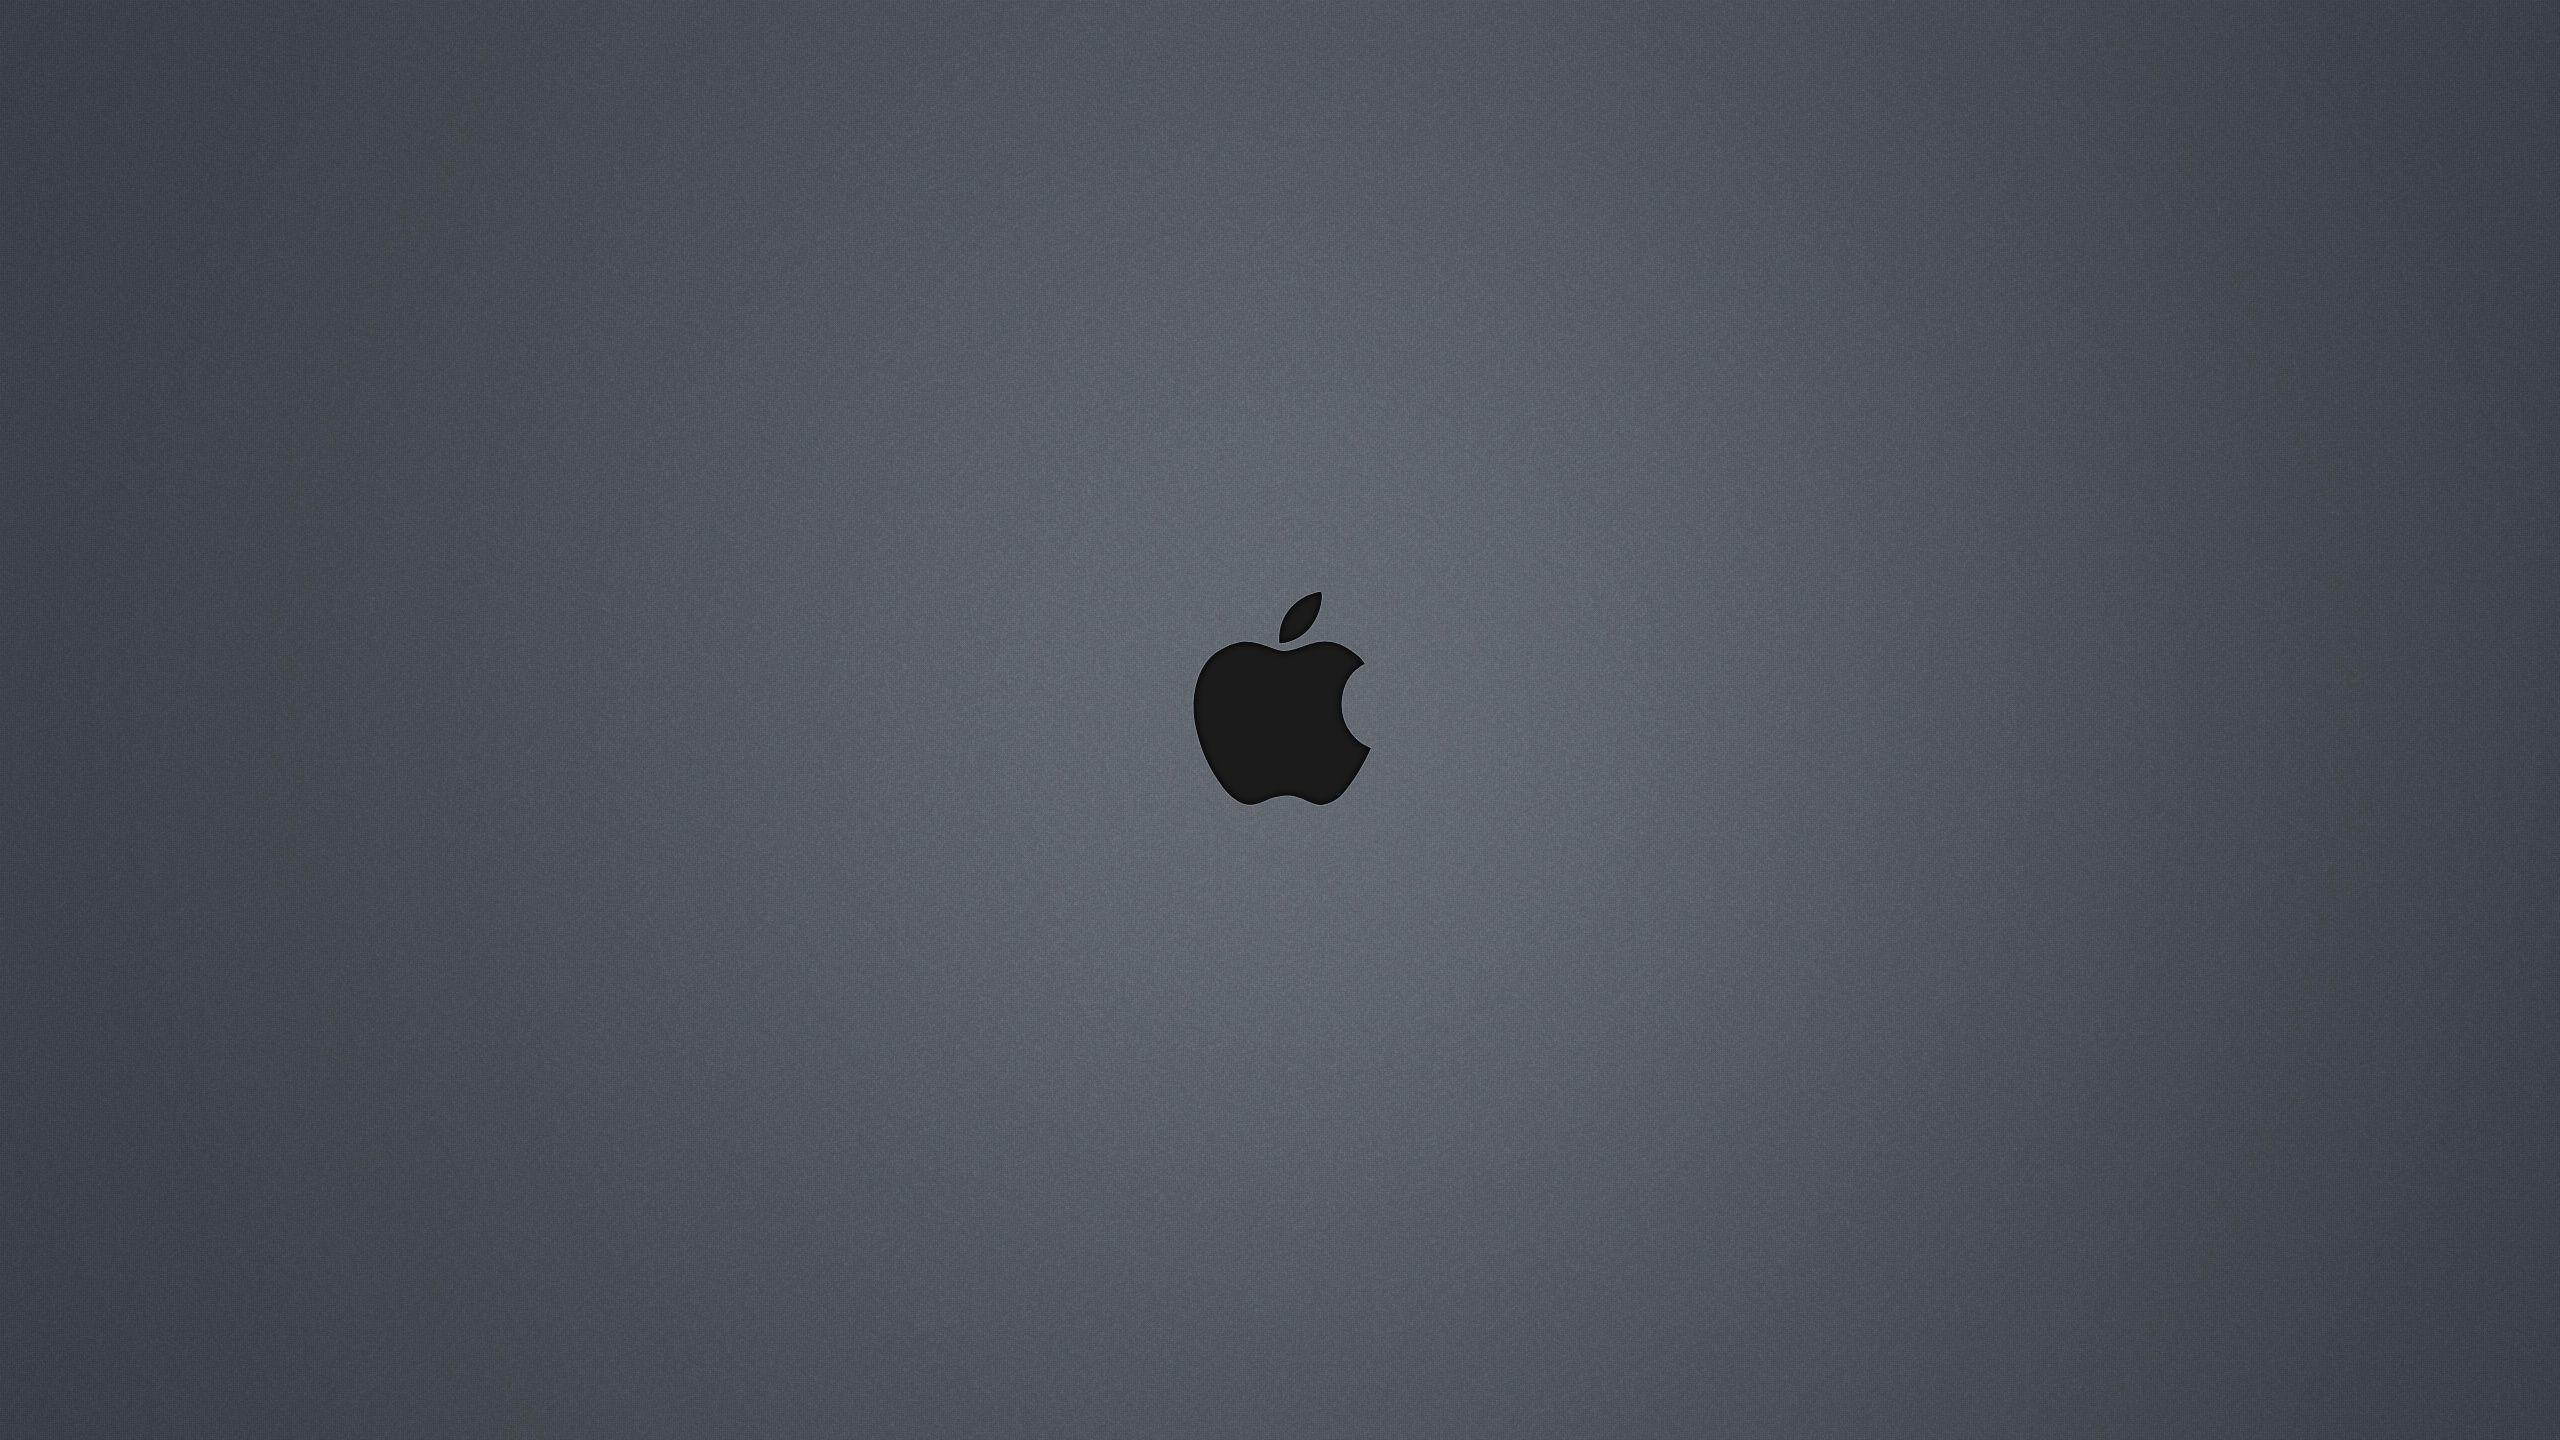 Res 2560x1440 Apple Pro Desktop Pc And Mac Wallpaper Macbook Pro Wallpaper Apple Wallpaper Hd Apple Wallpapers